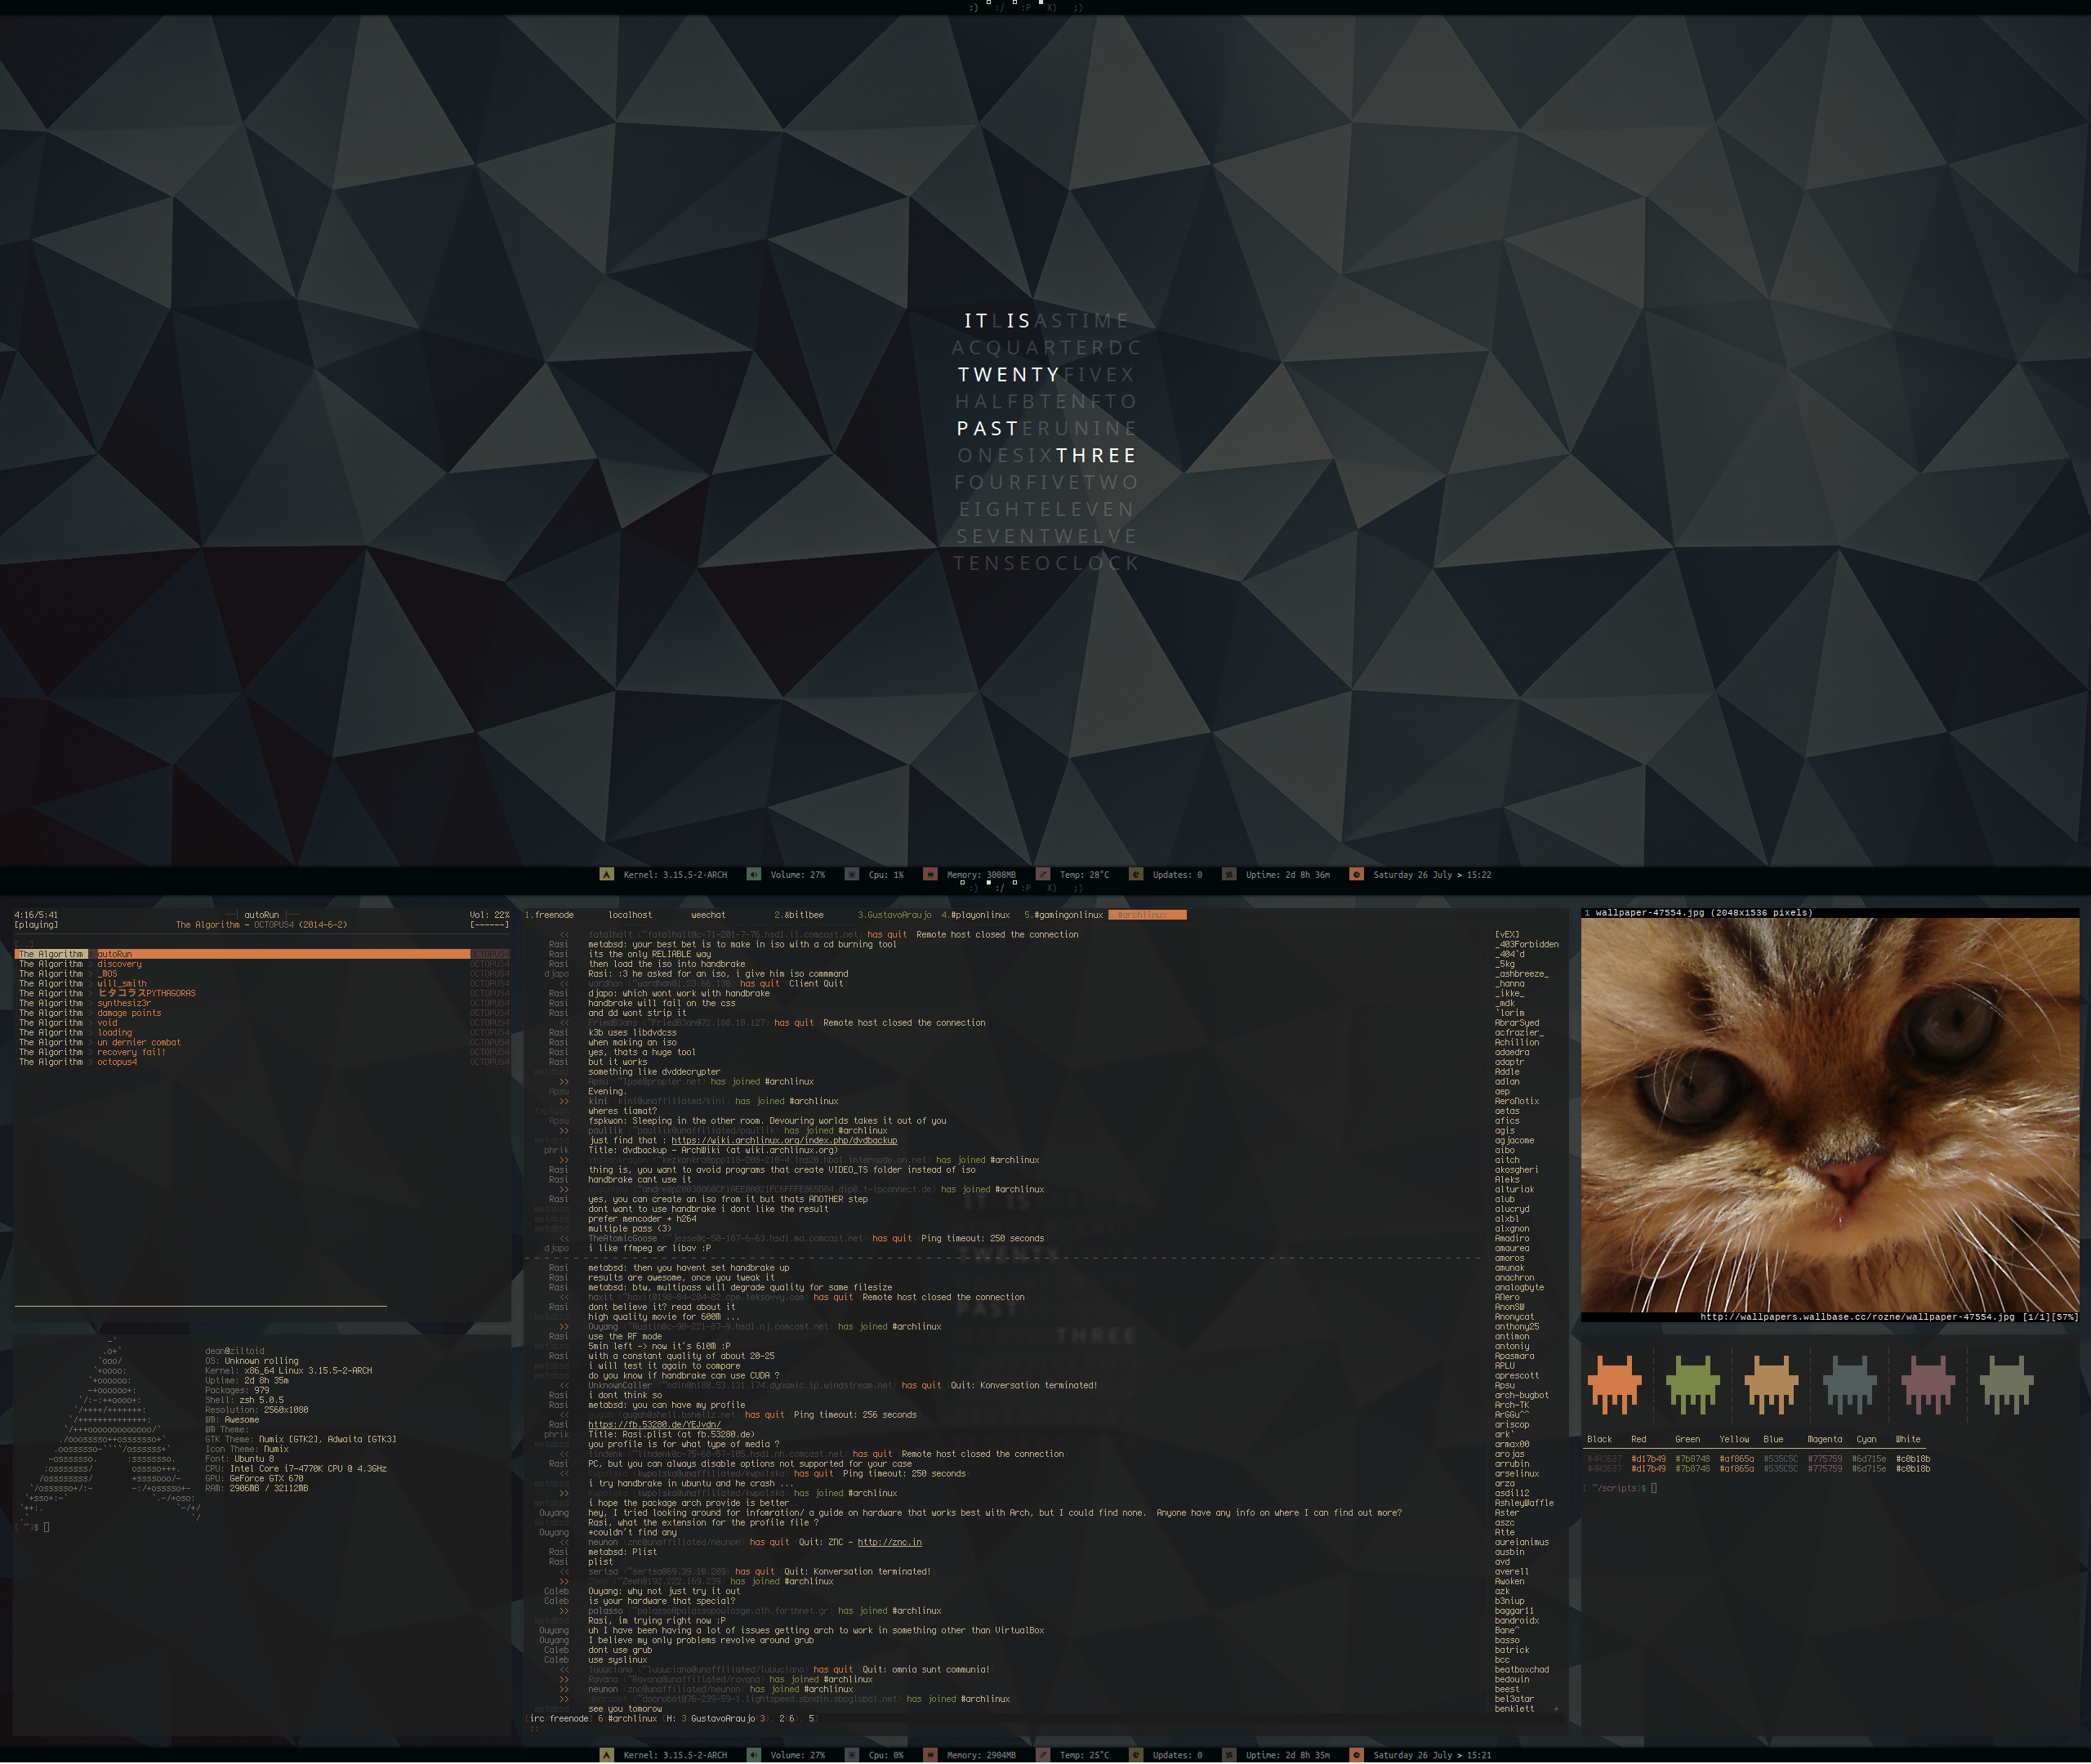 [arch] [awesomewm] July Desktop 2014 (v2) by transienceband